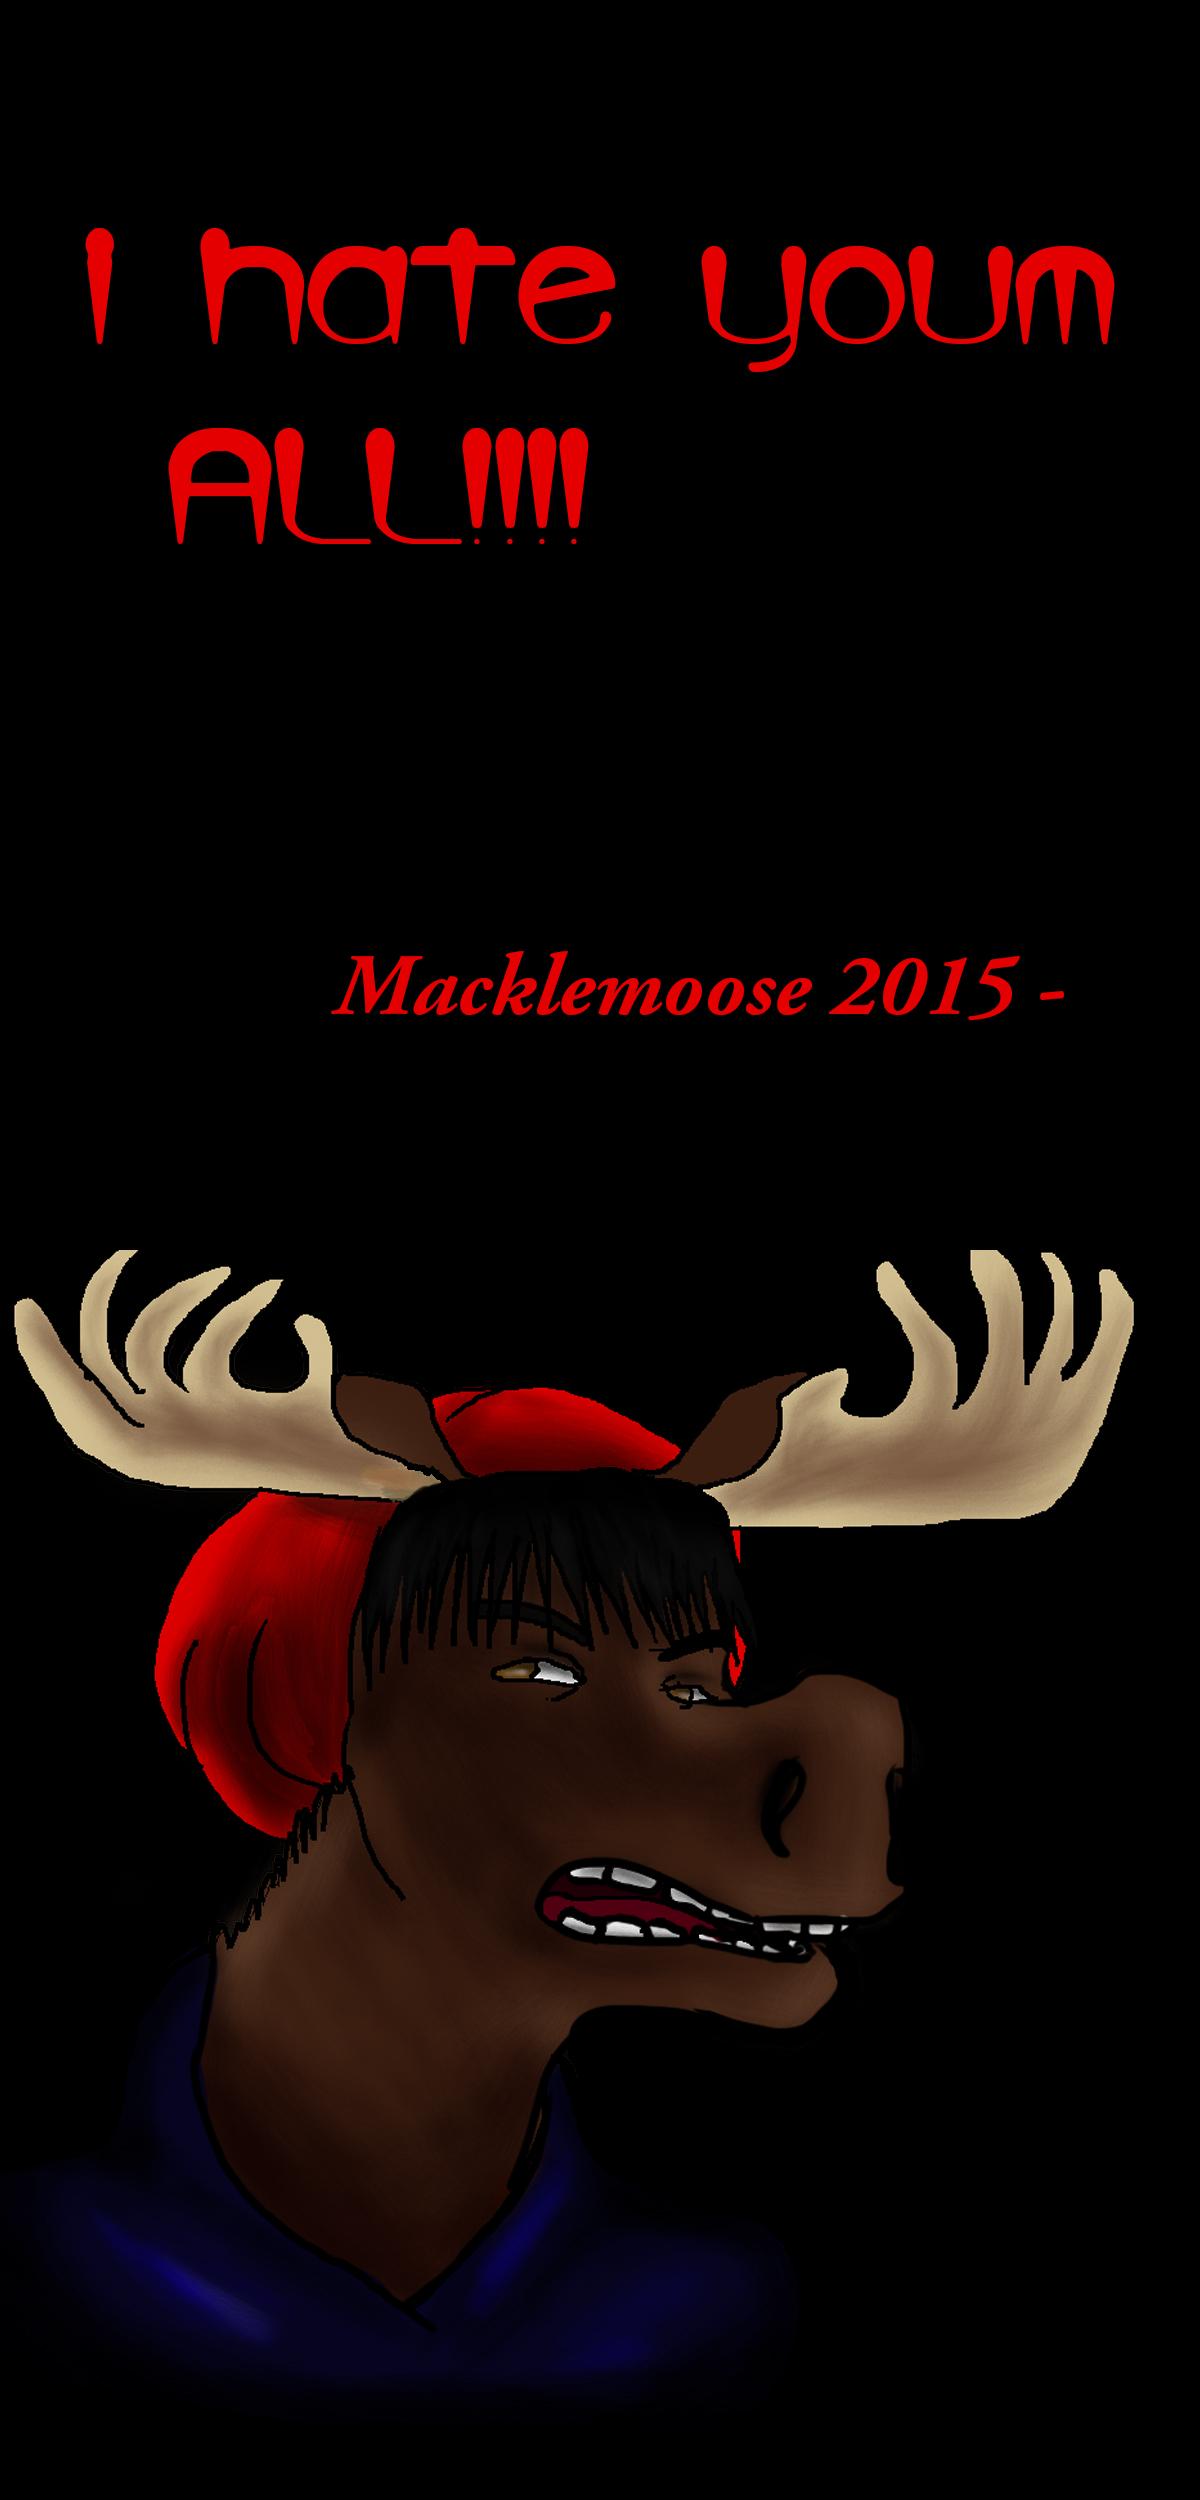 Mackle Moose